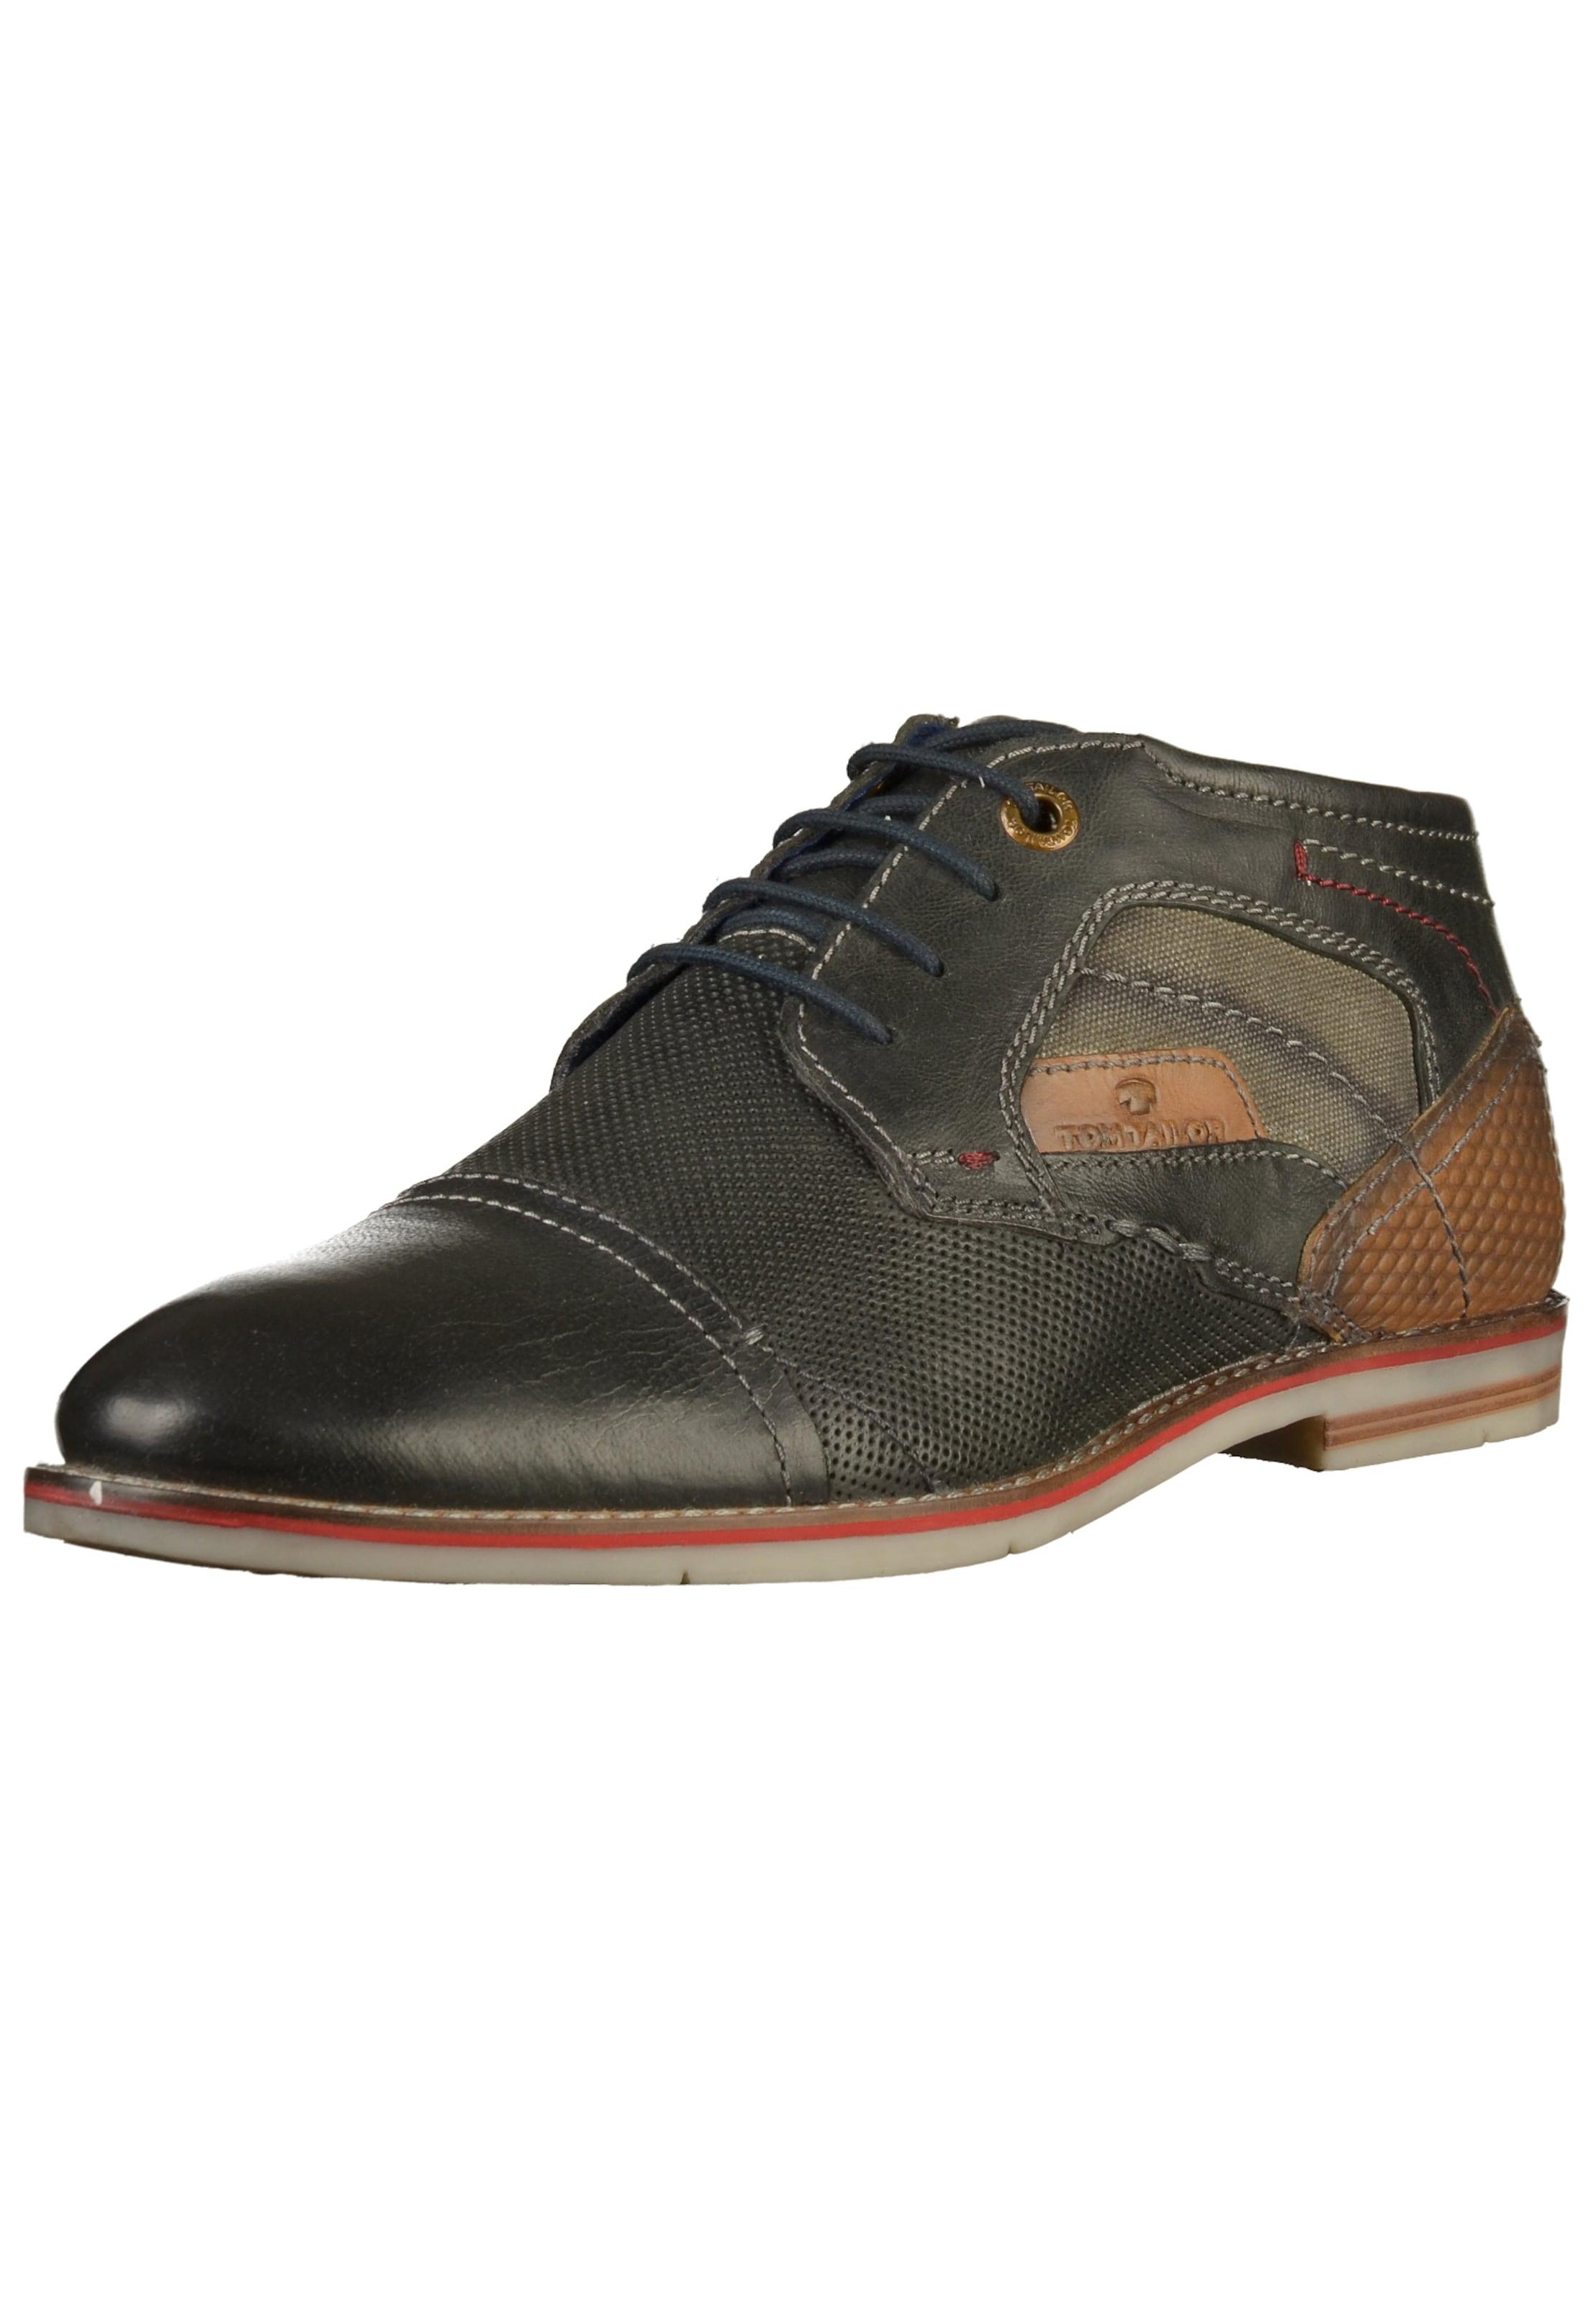 TOM TAILOR Halbschuhe Verschleißfeste billige Schuhe